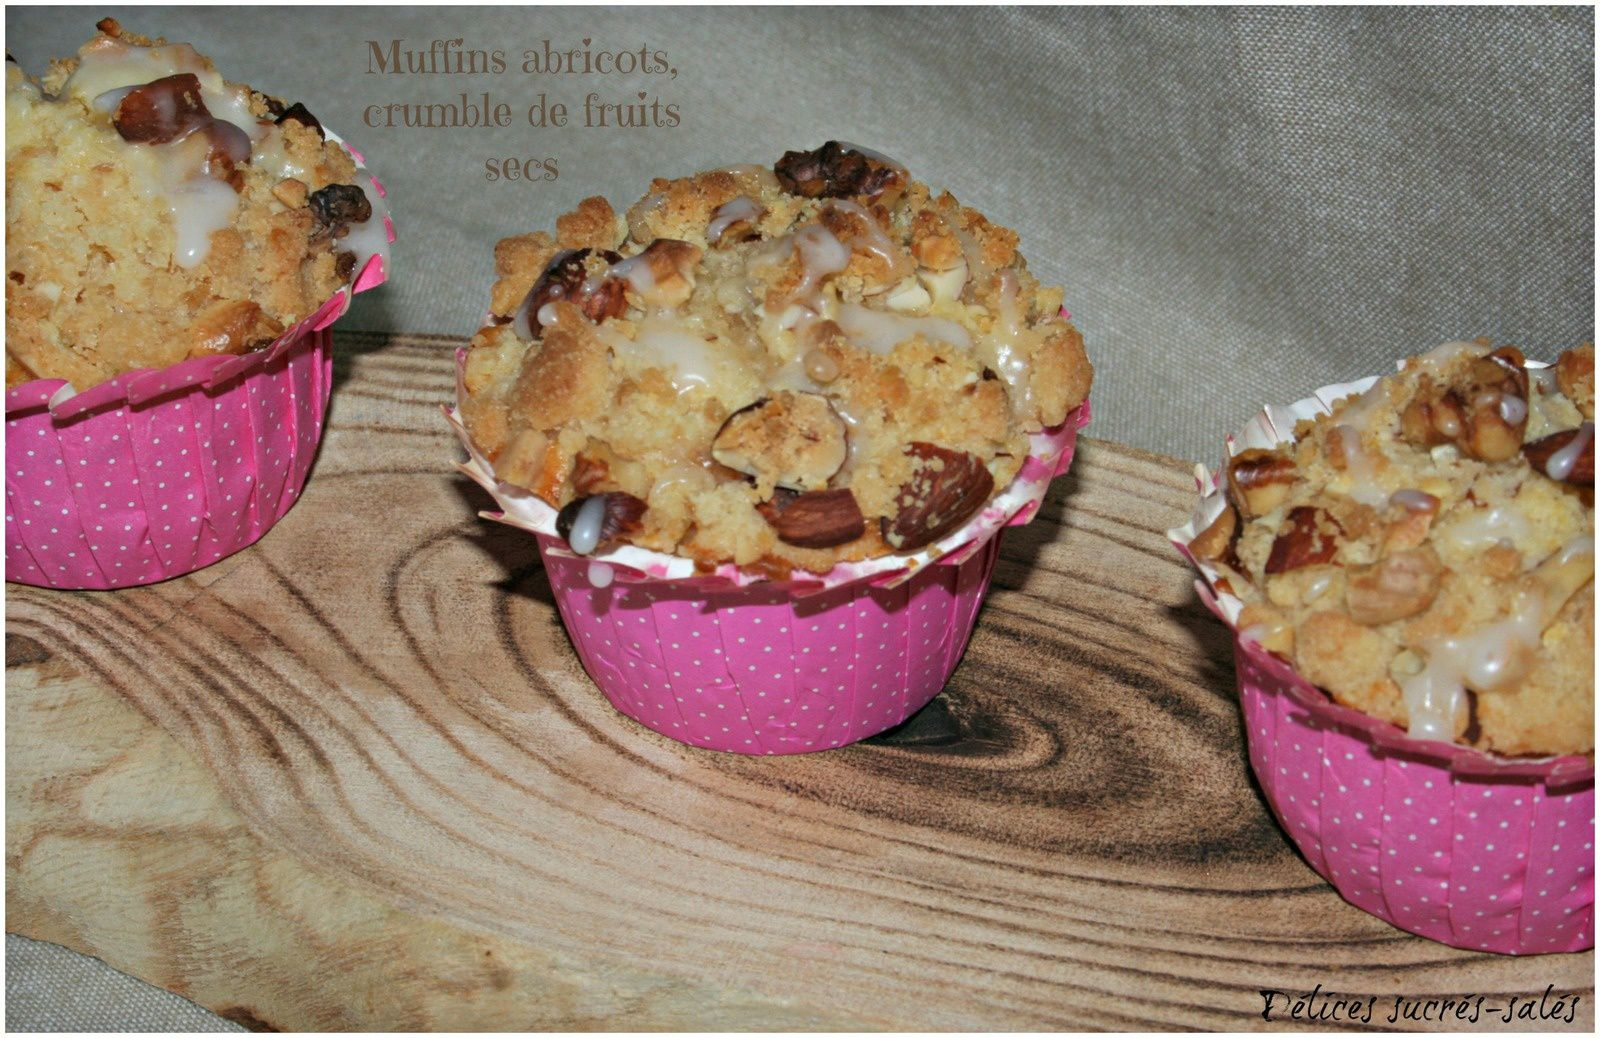 Muffins abricots, crumble de fruits secs